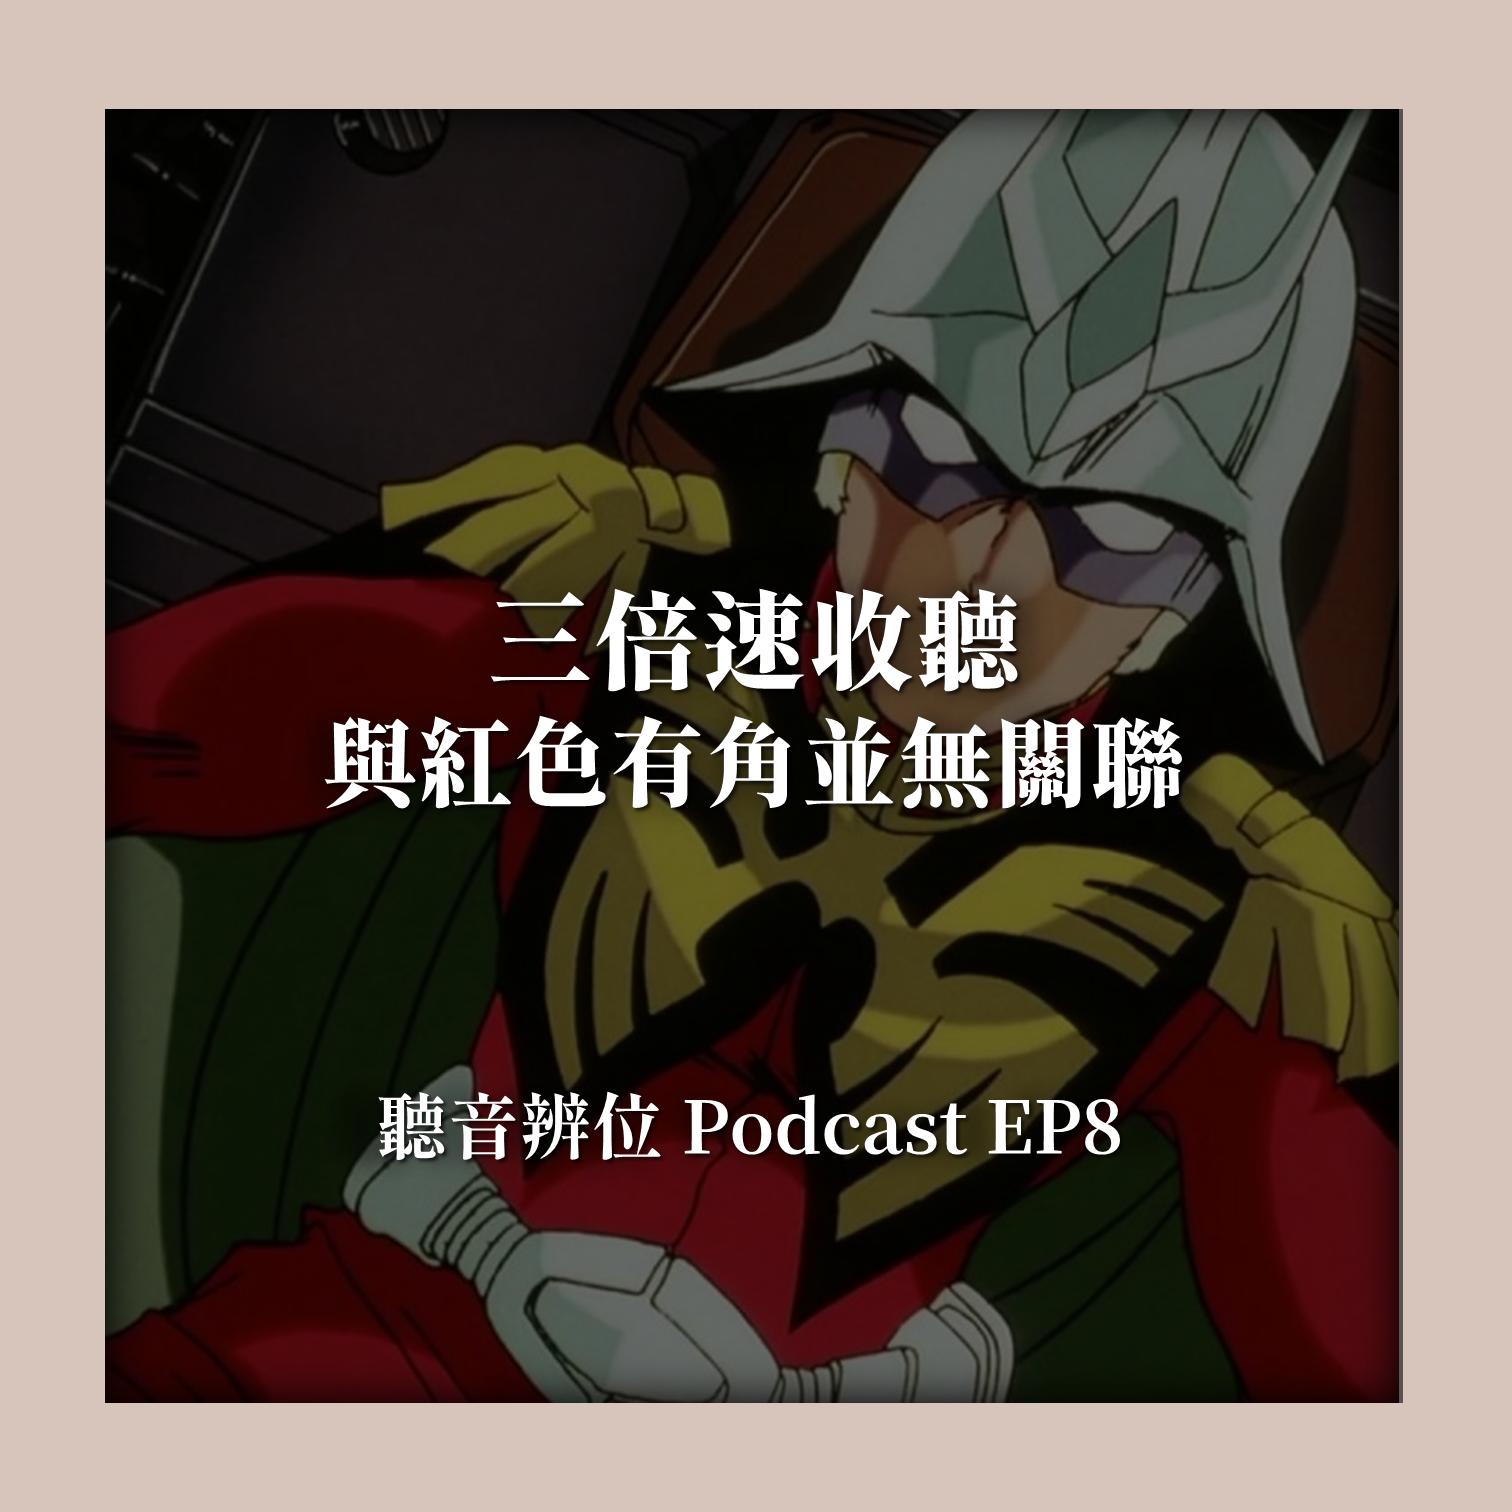 EP8 三倍速收聽與紅色有角並無關聯